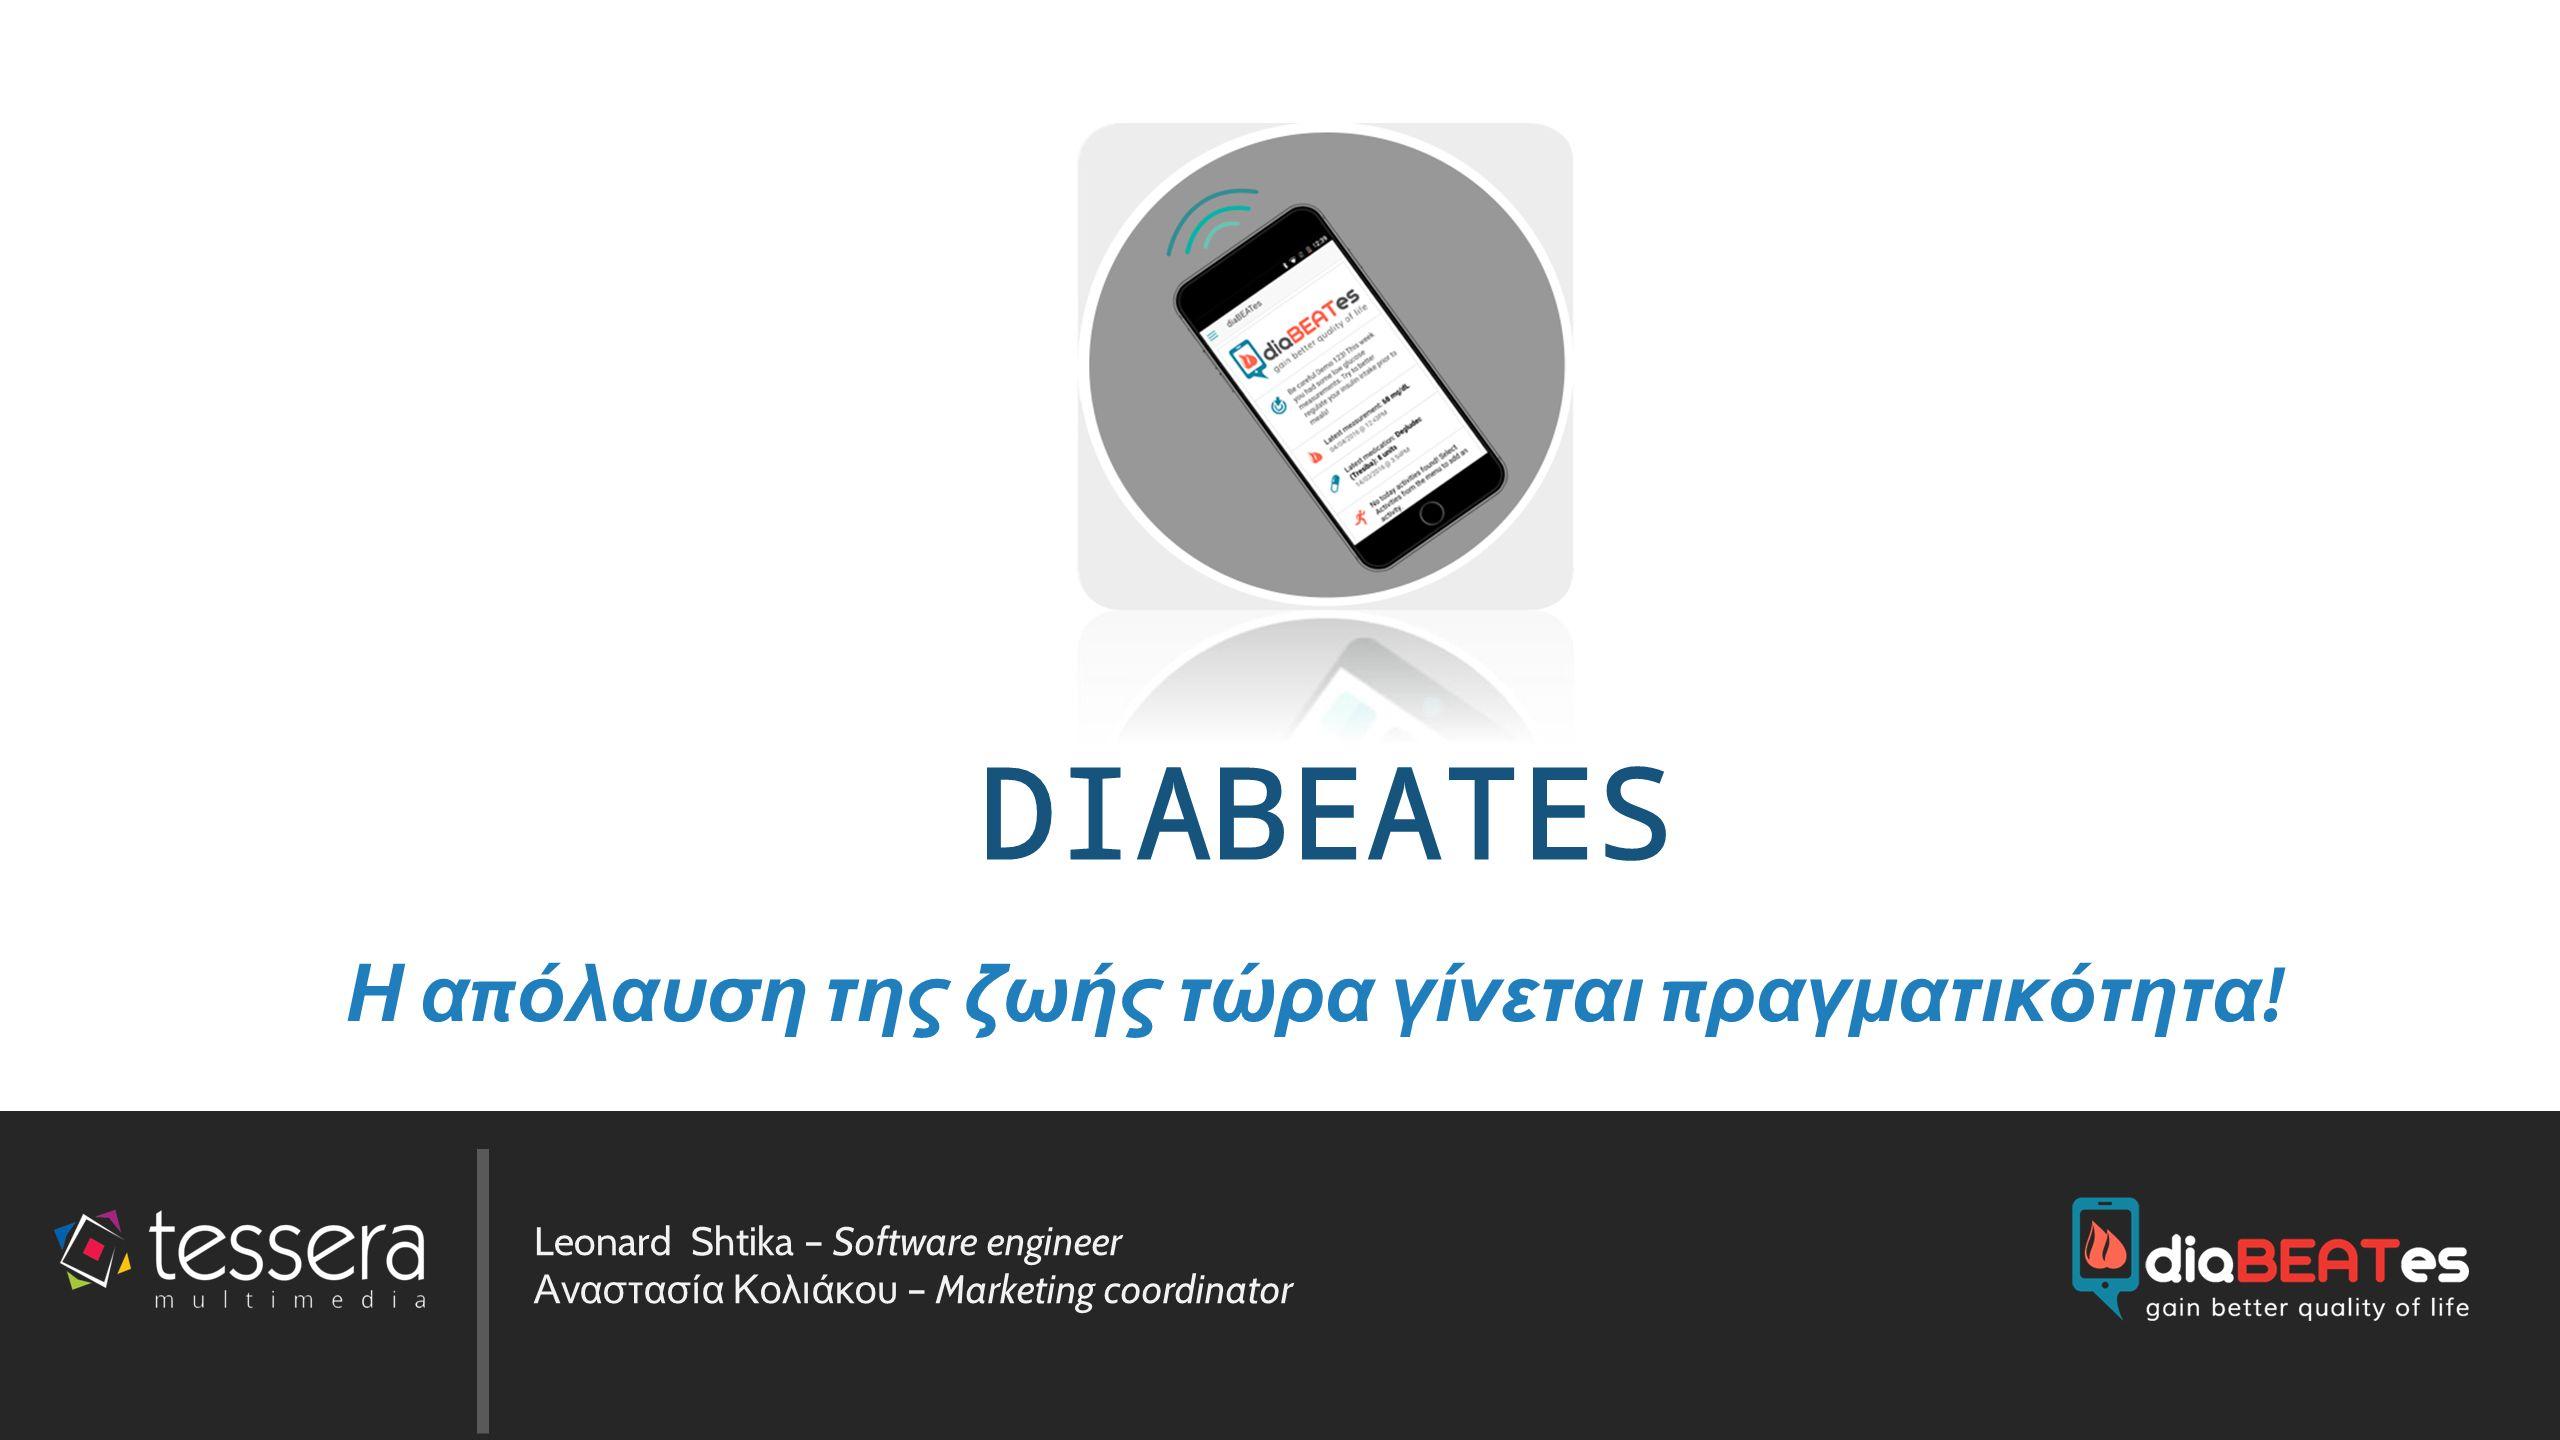 company logo & name Smartwatch & ενσωμάτωση με mobile εφαρμογή ( στιγμιότυ π α ) Αρχική οθόνη smartwatch Κουμπί παρακολούθησης καρδιακού παλμού Ένδειξη καρδιακού παλμού Κλήση σε μη φυσιολογικό καρδιακό παλμό